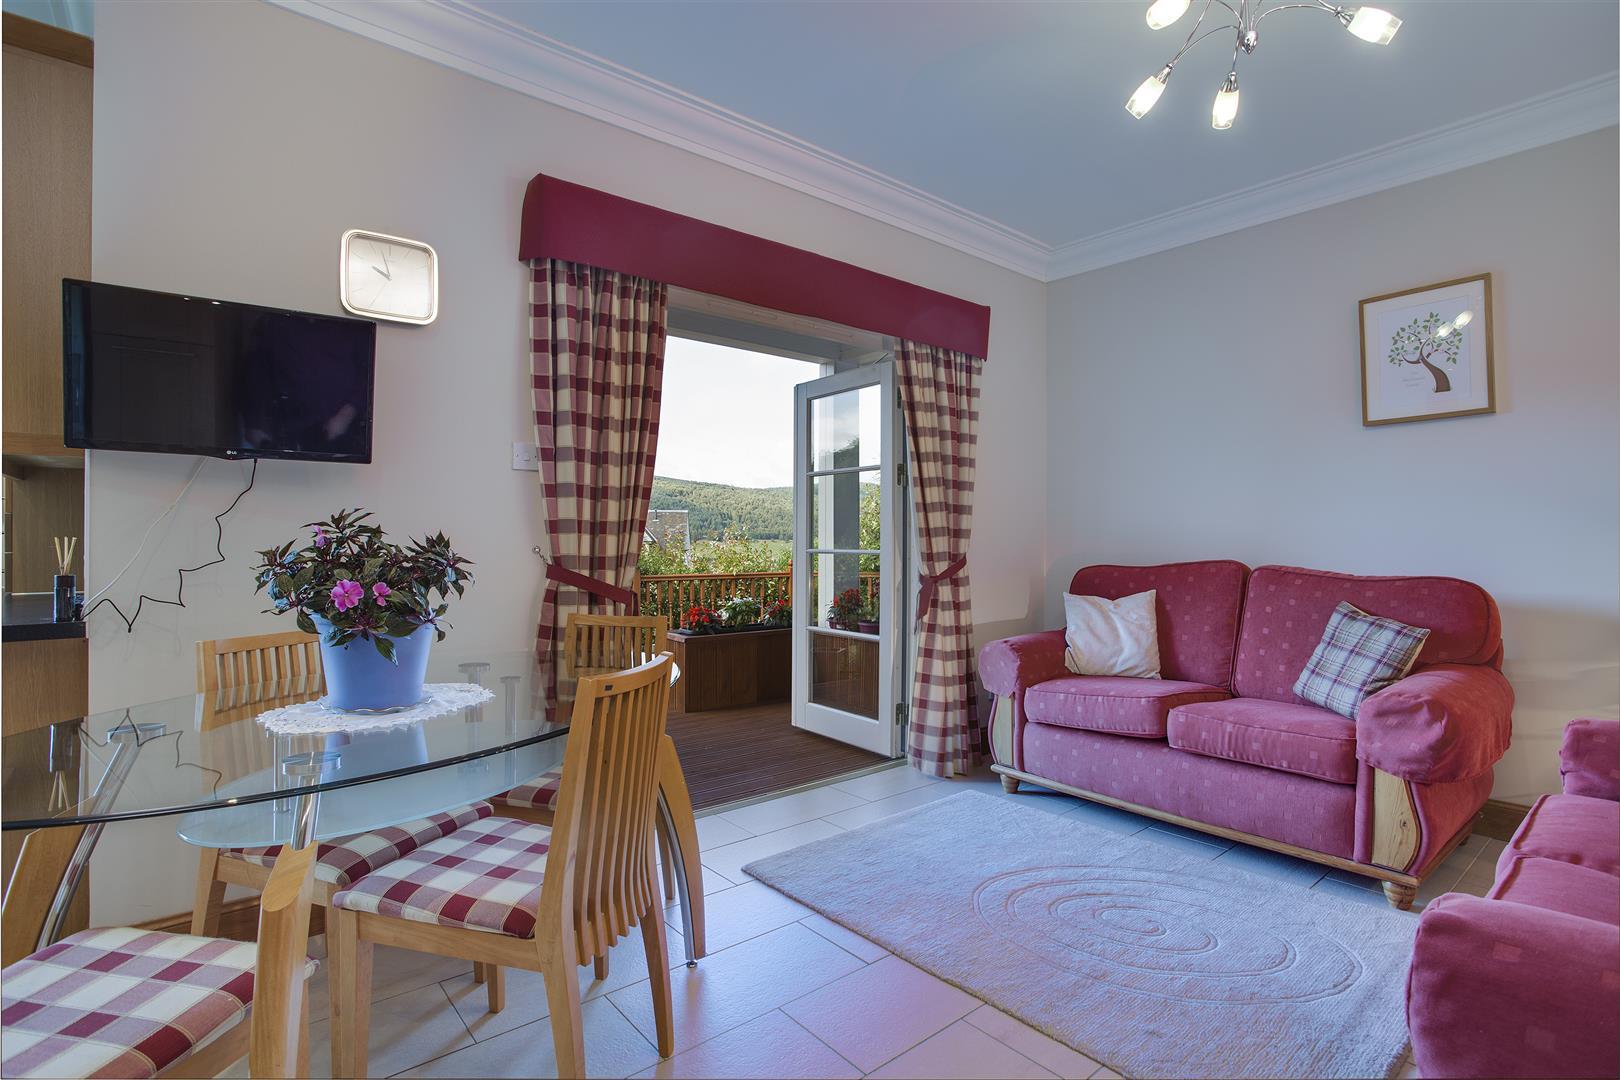 Strathlene, Croftinloan, Pitlochry, PH16 5TA, UK